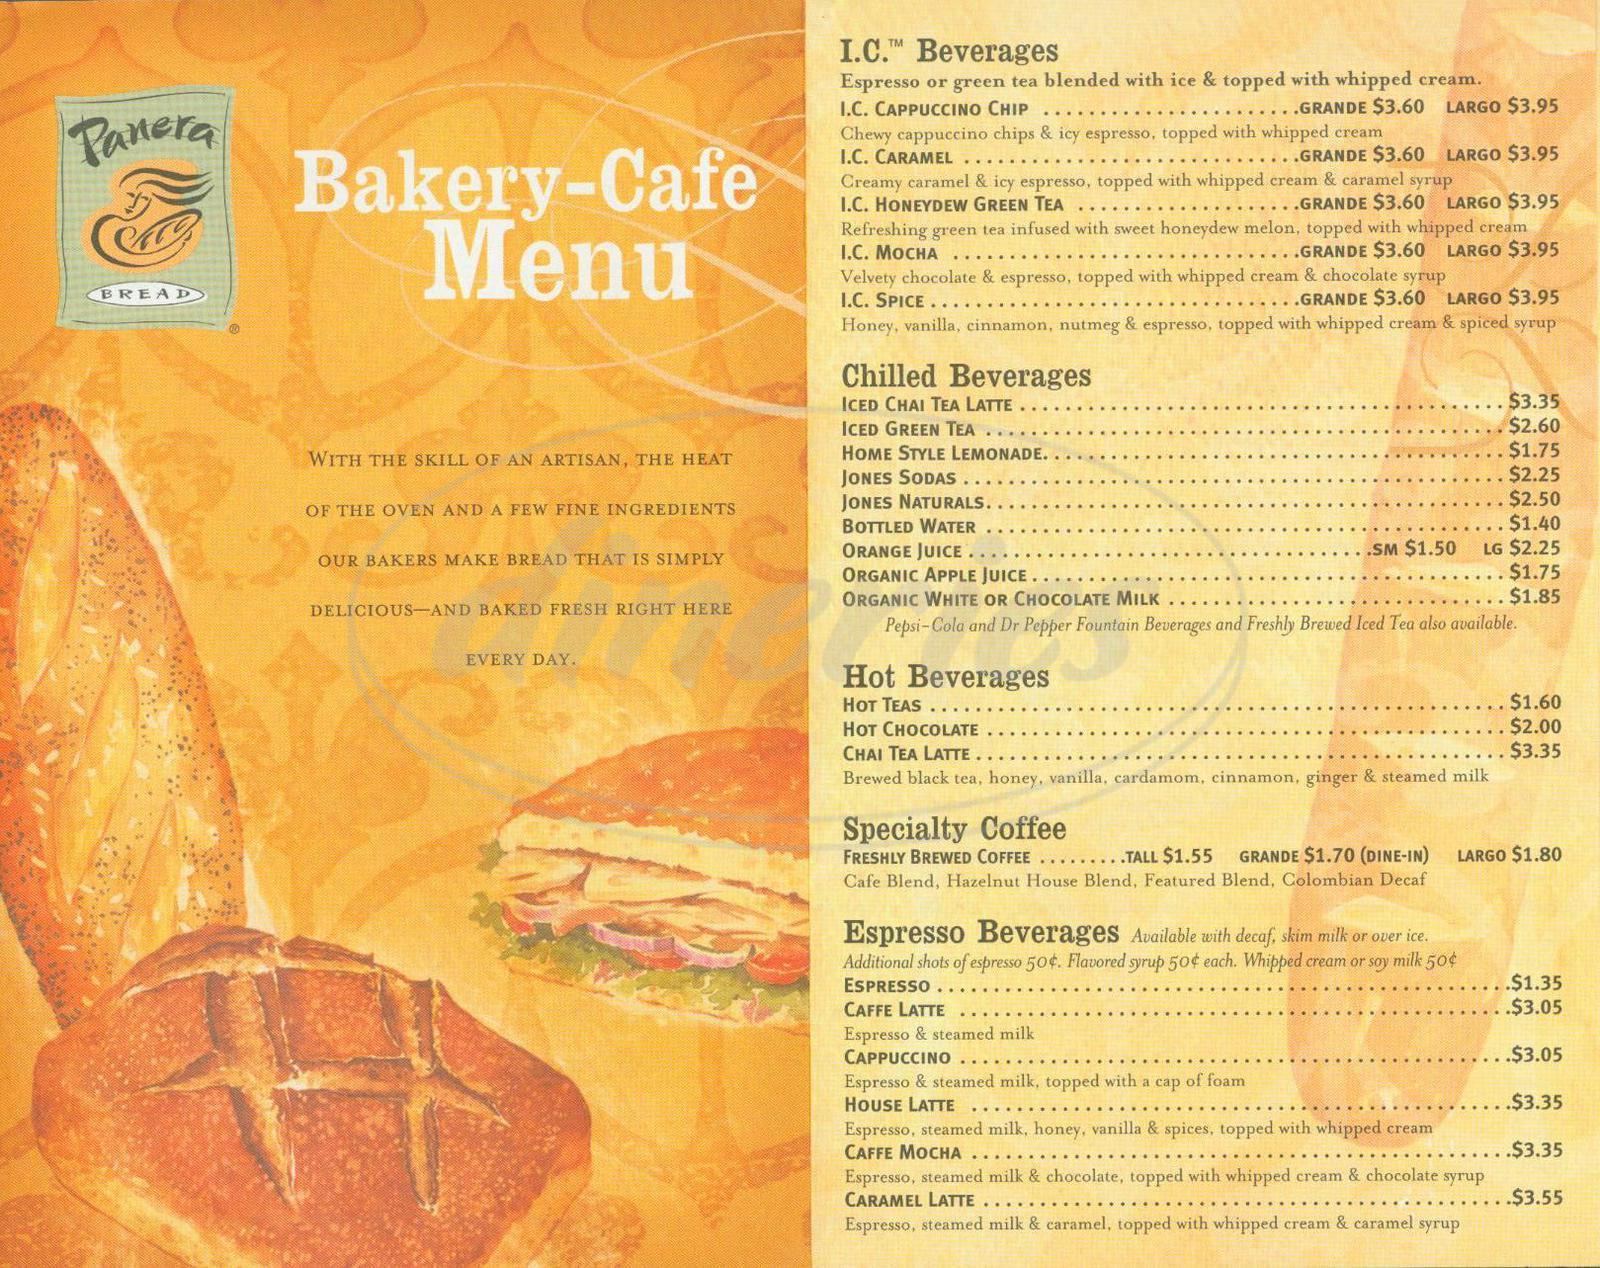 image about Panera Printable Catering Menu named Panera Bread Large Menu - Irvine - Dineries